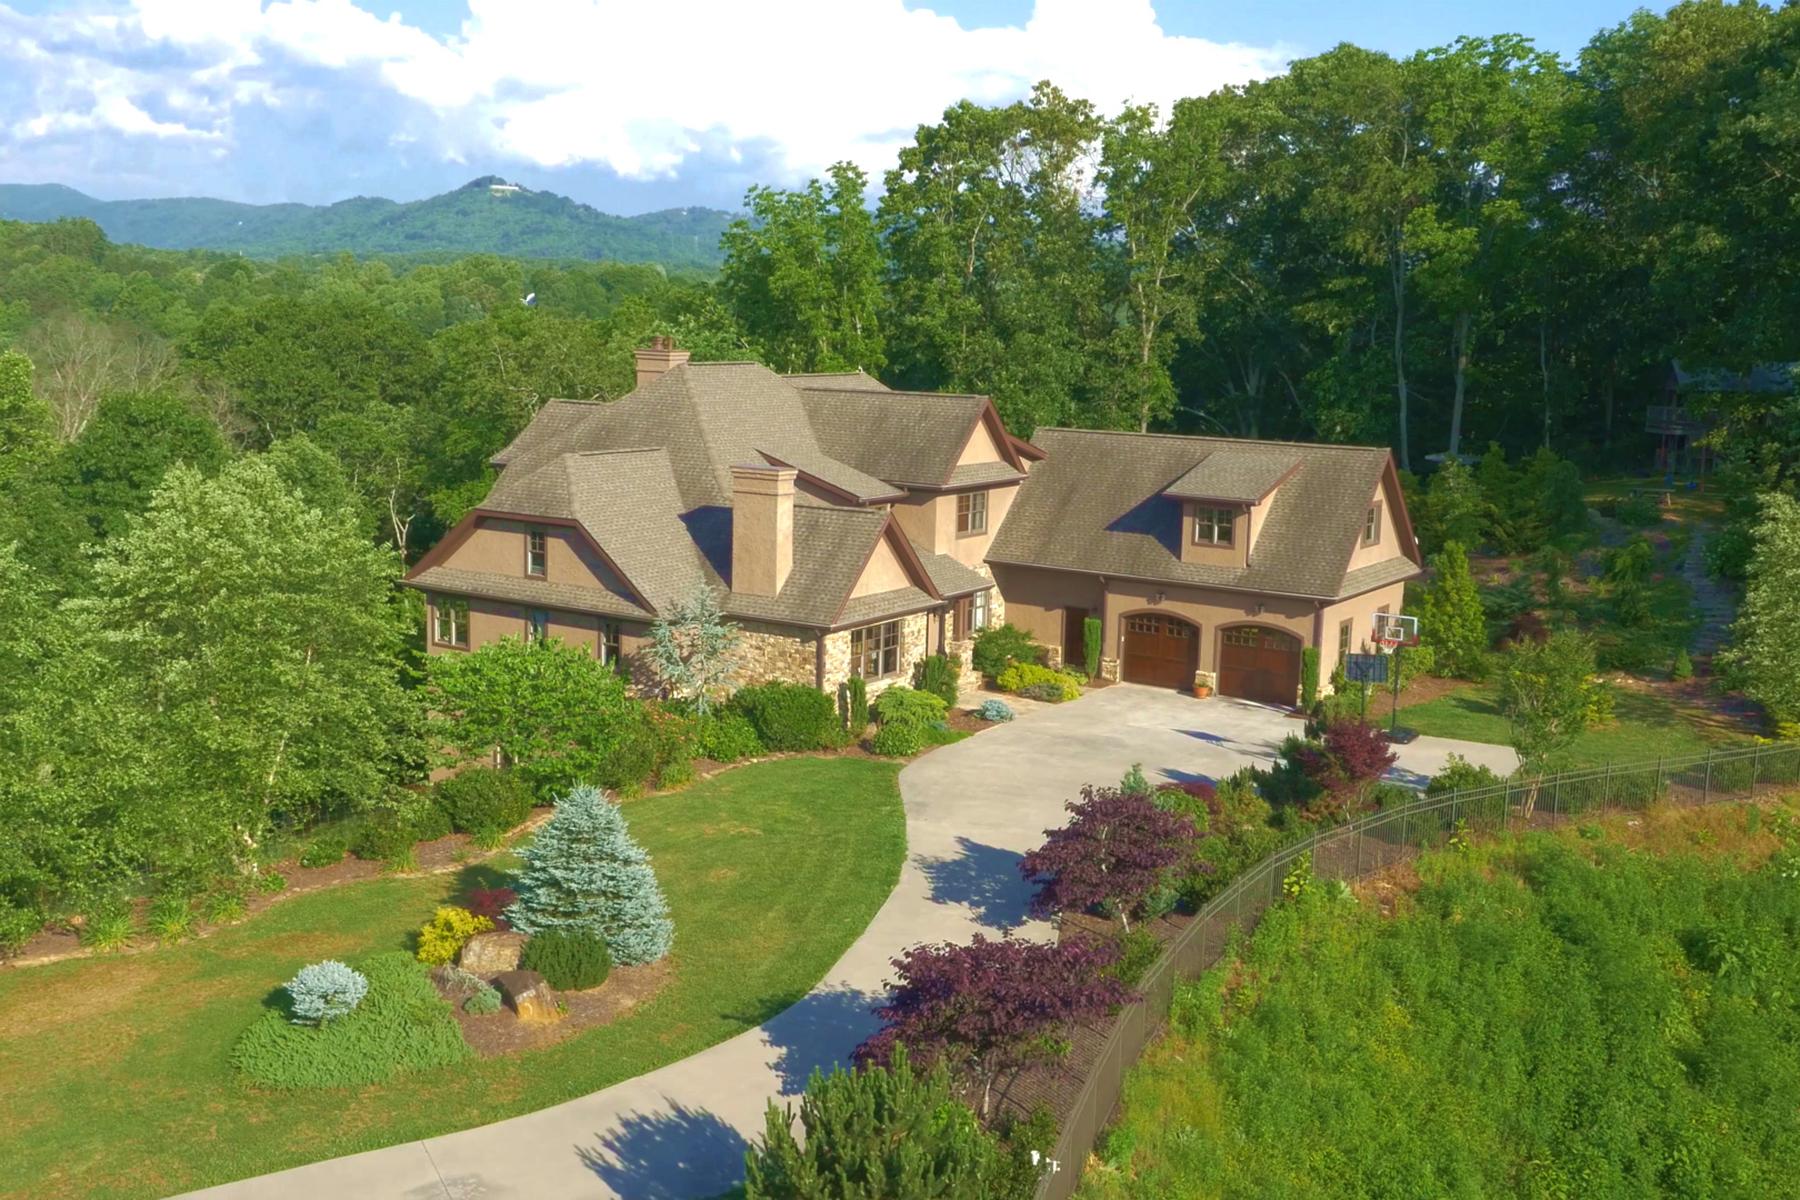 Single Family Home for Sale at ALEXANDER 25 Olivia Cir Alexander, North Carolina, 28701 United States